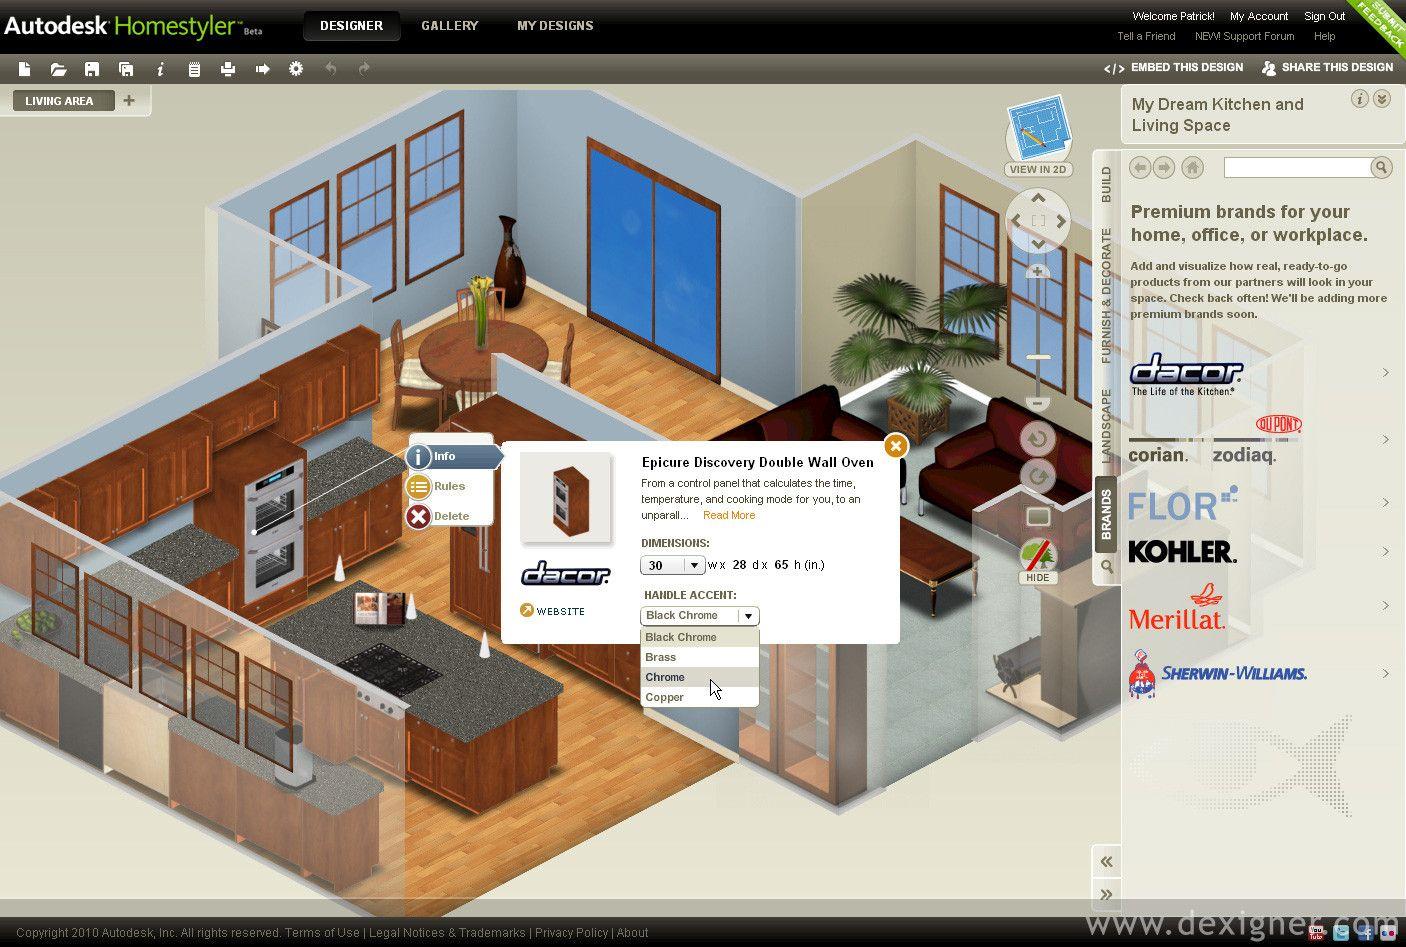 Top 15 Virtual Room Software Tools And Programs Home Design Software Home Design Programs Interior Design Software